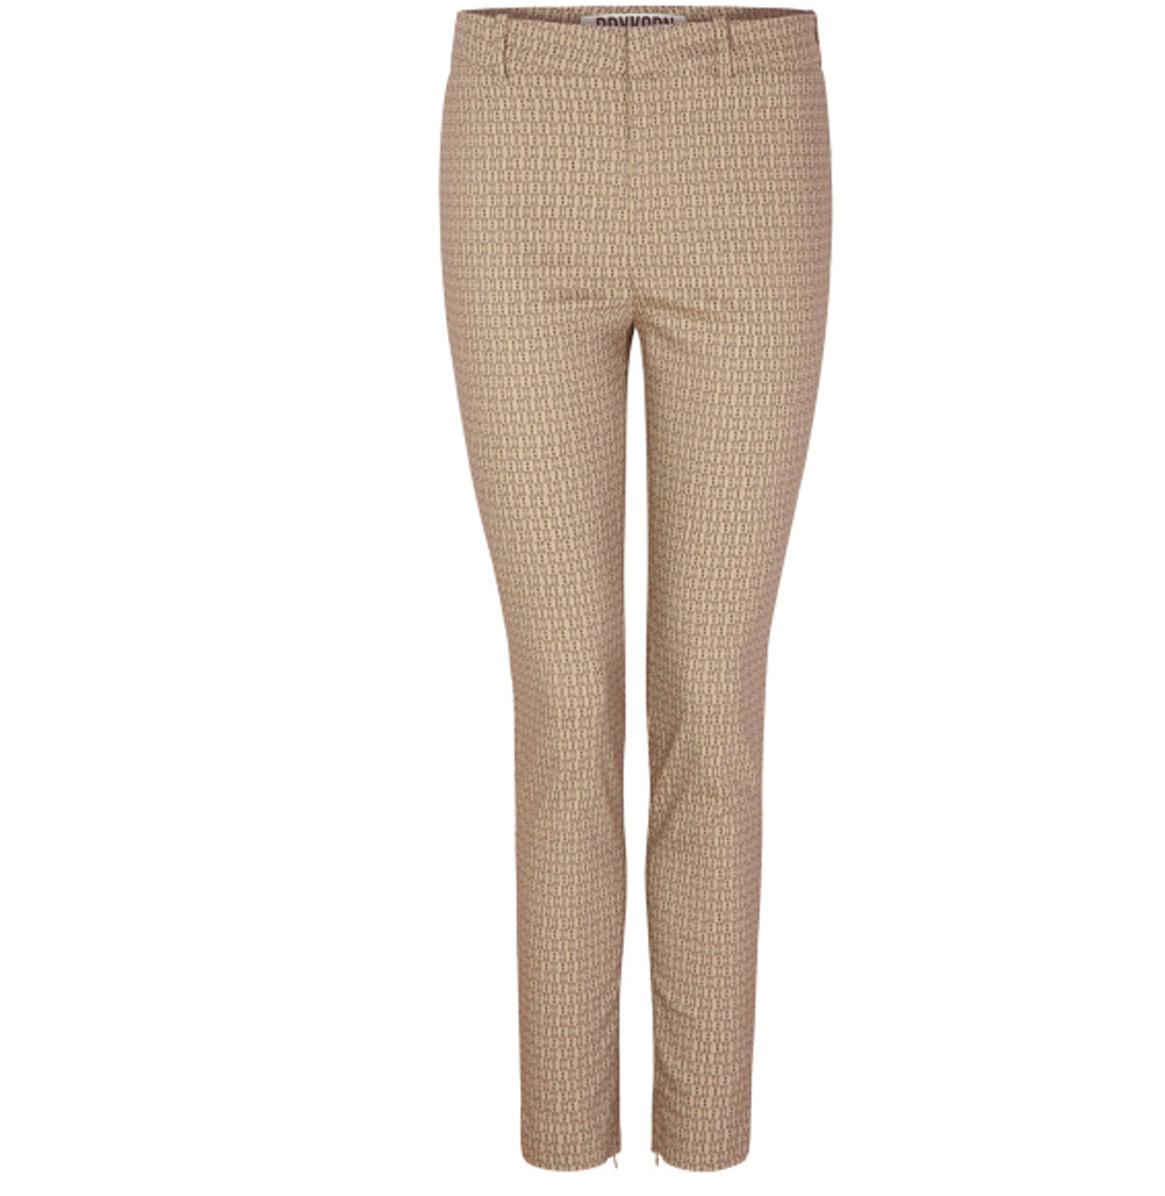 Drykorn pantalon winch color 1700   drykorn